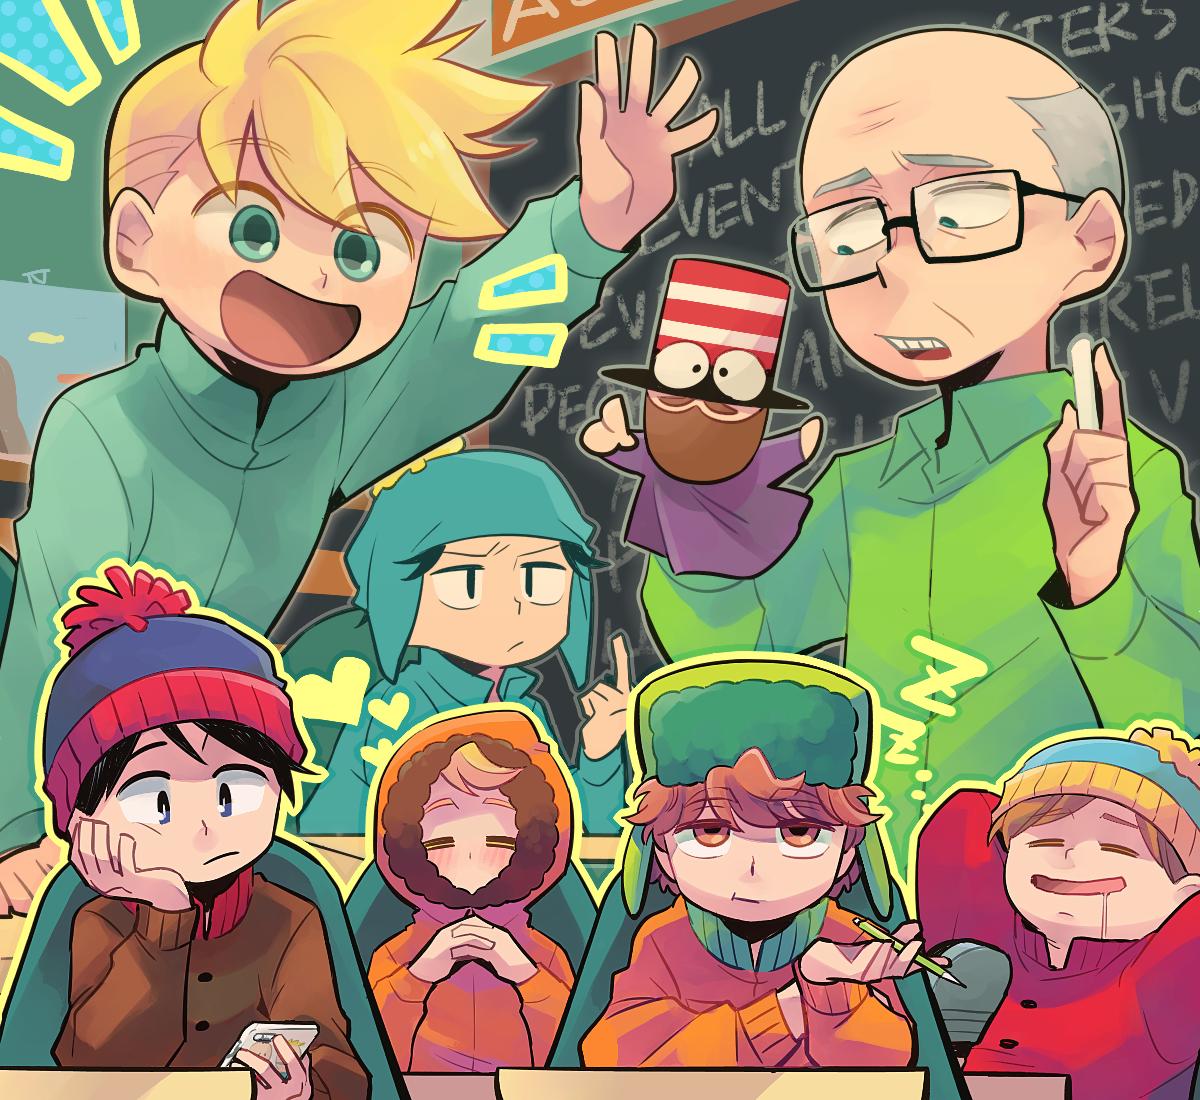 70 South Park Fanart Ideas South Park Fanart South Park South Park Anime